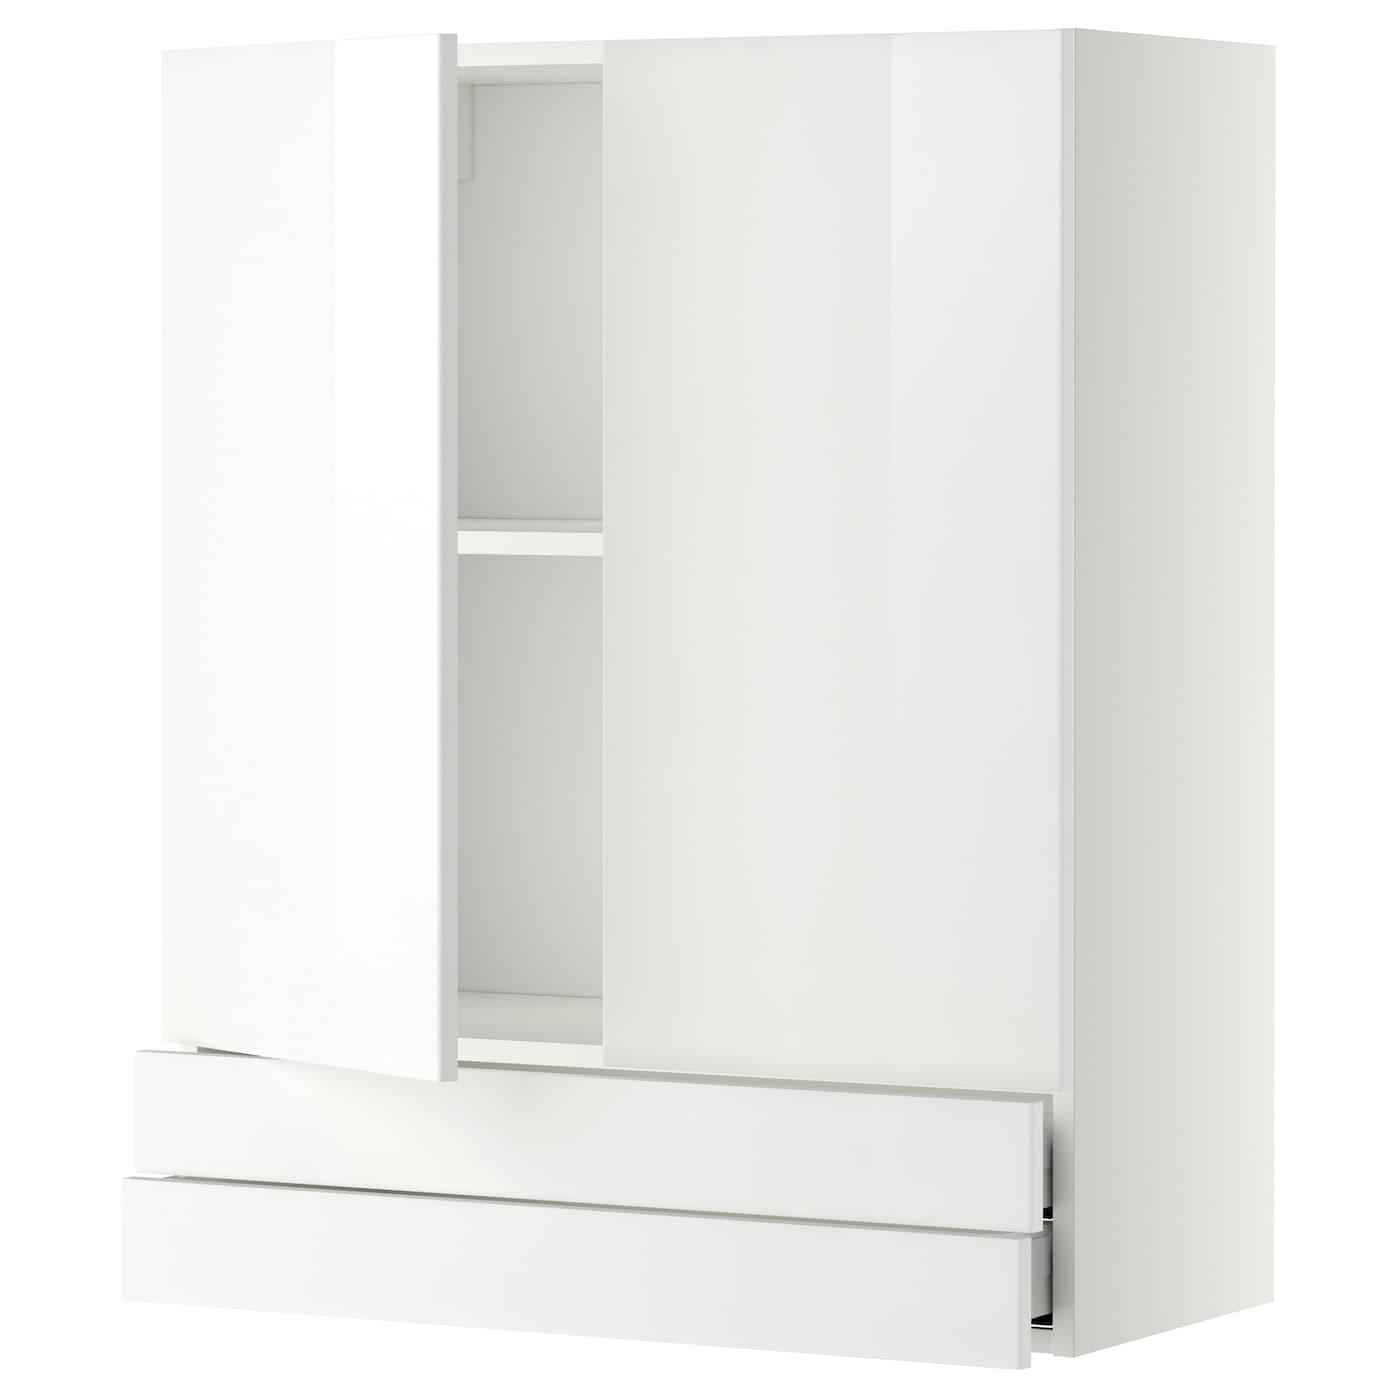 metod maximera l ment mural 2portes 2tiroirs blanc ringhult blanc 80x100 cm ikea. Black Bedroom Furniture Sets. Home Design Ideas